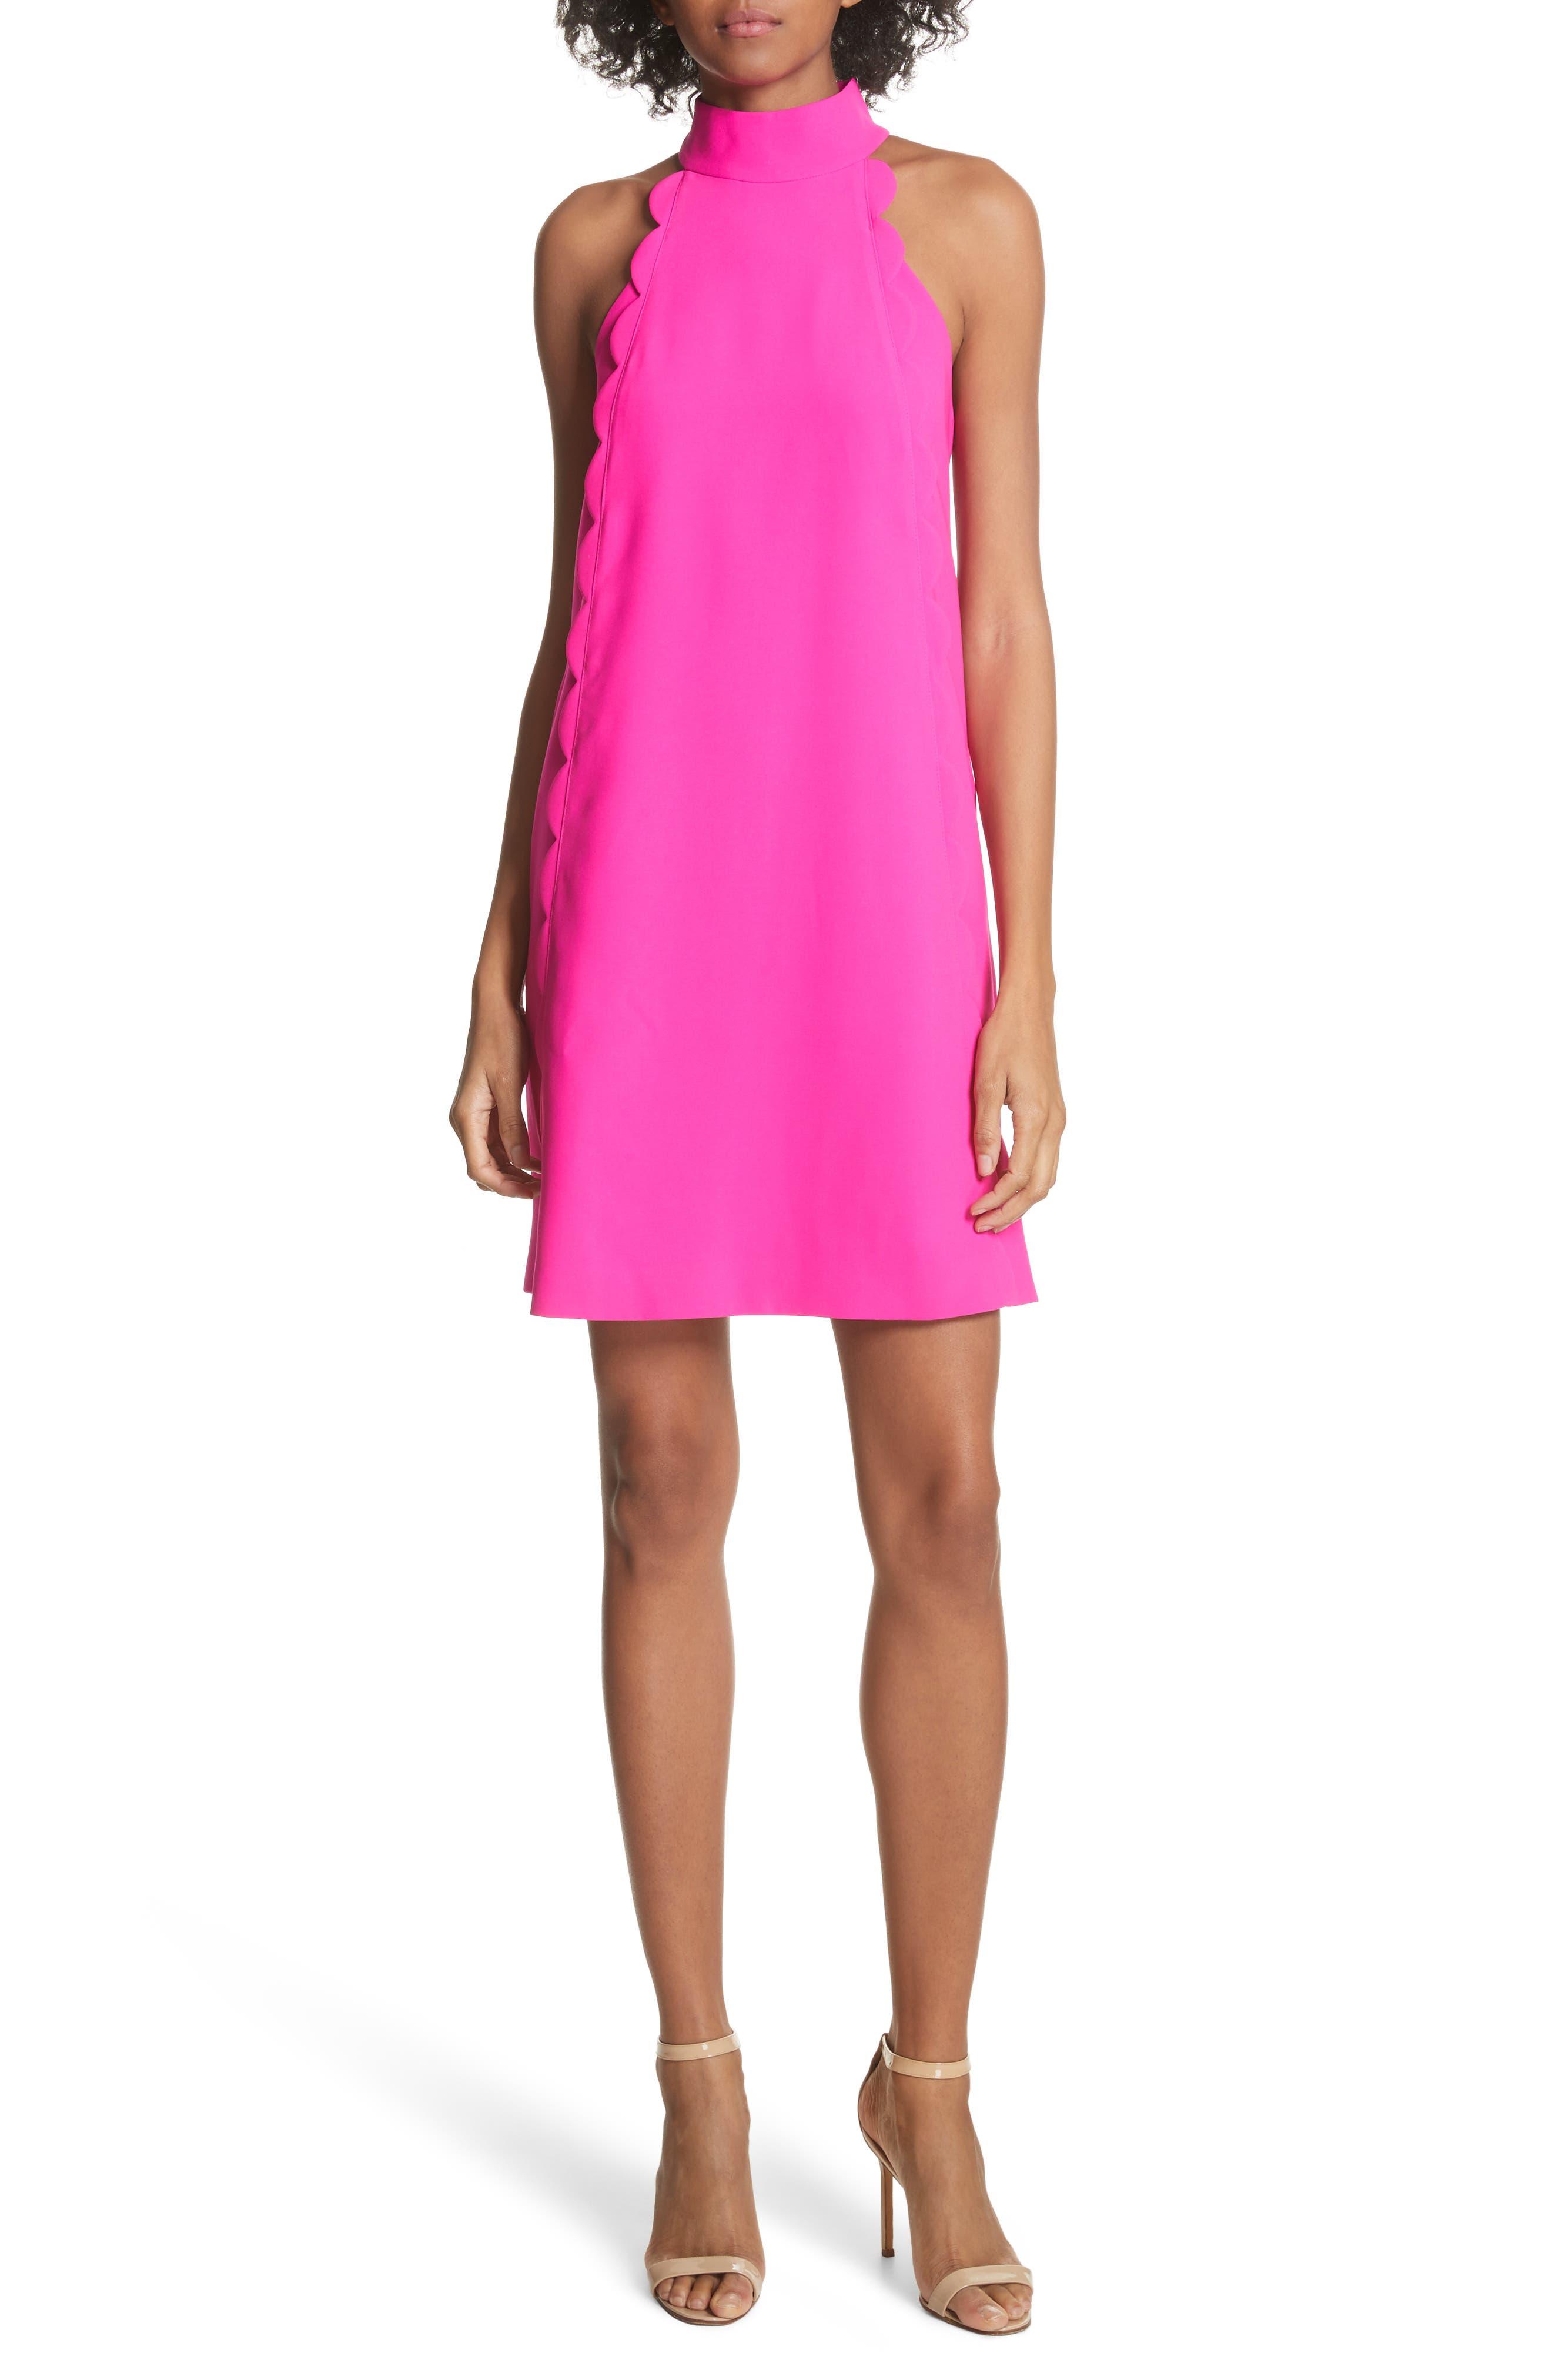 Torrii High Neck Tunic Dress,                             Main thumbnail 1, color,                             Bright Pink